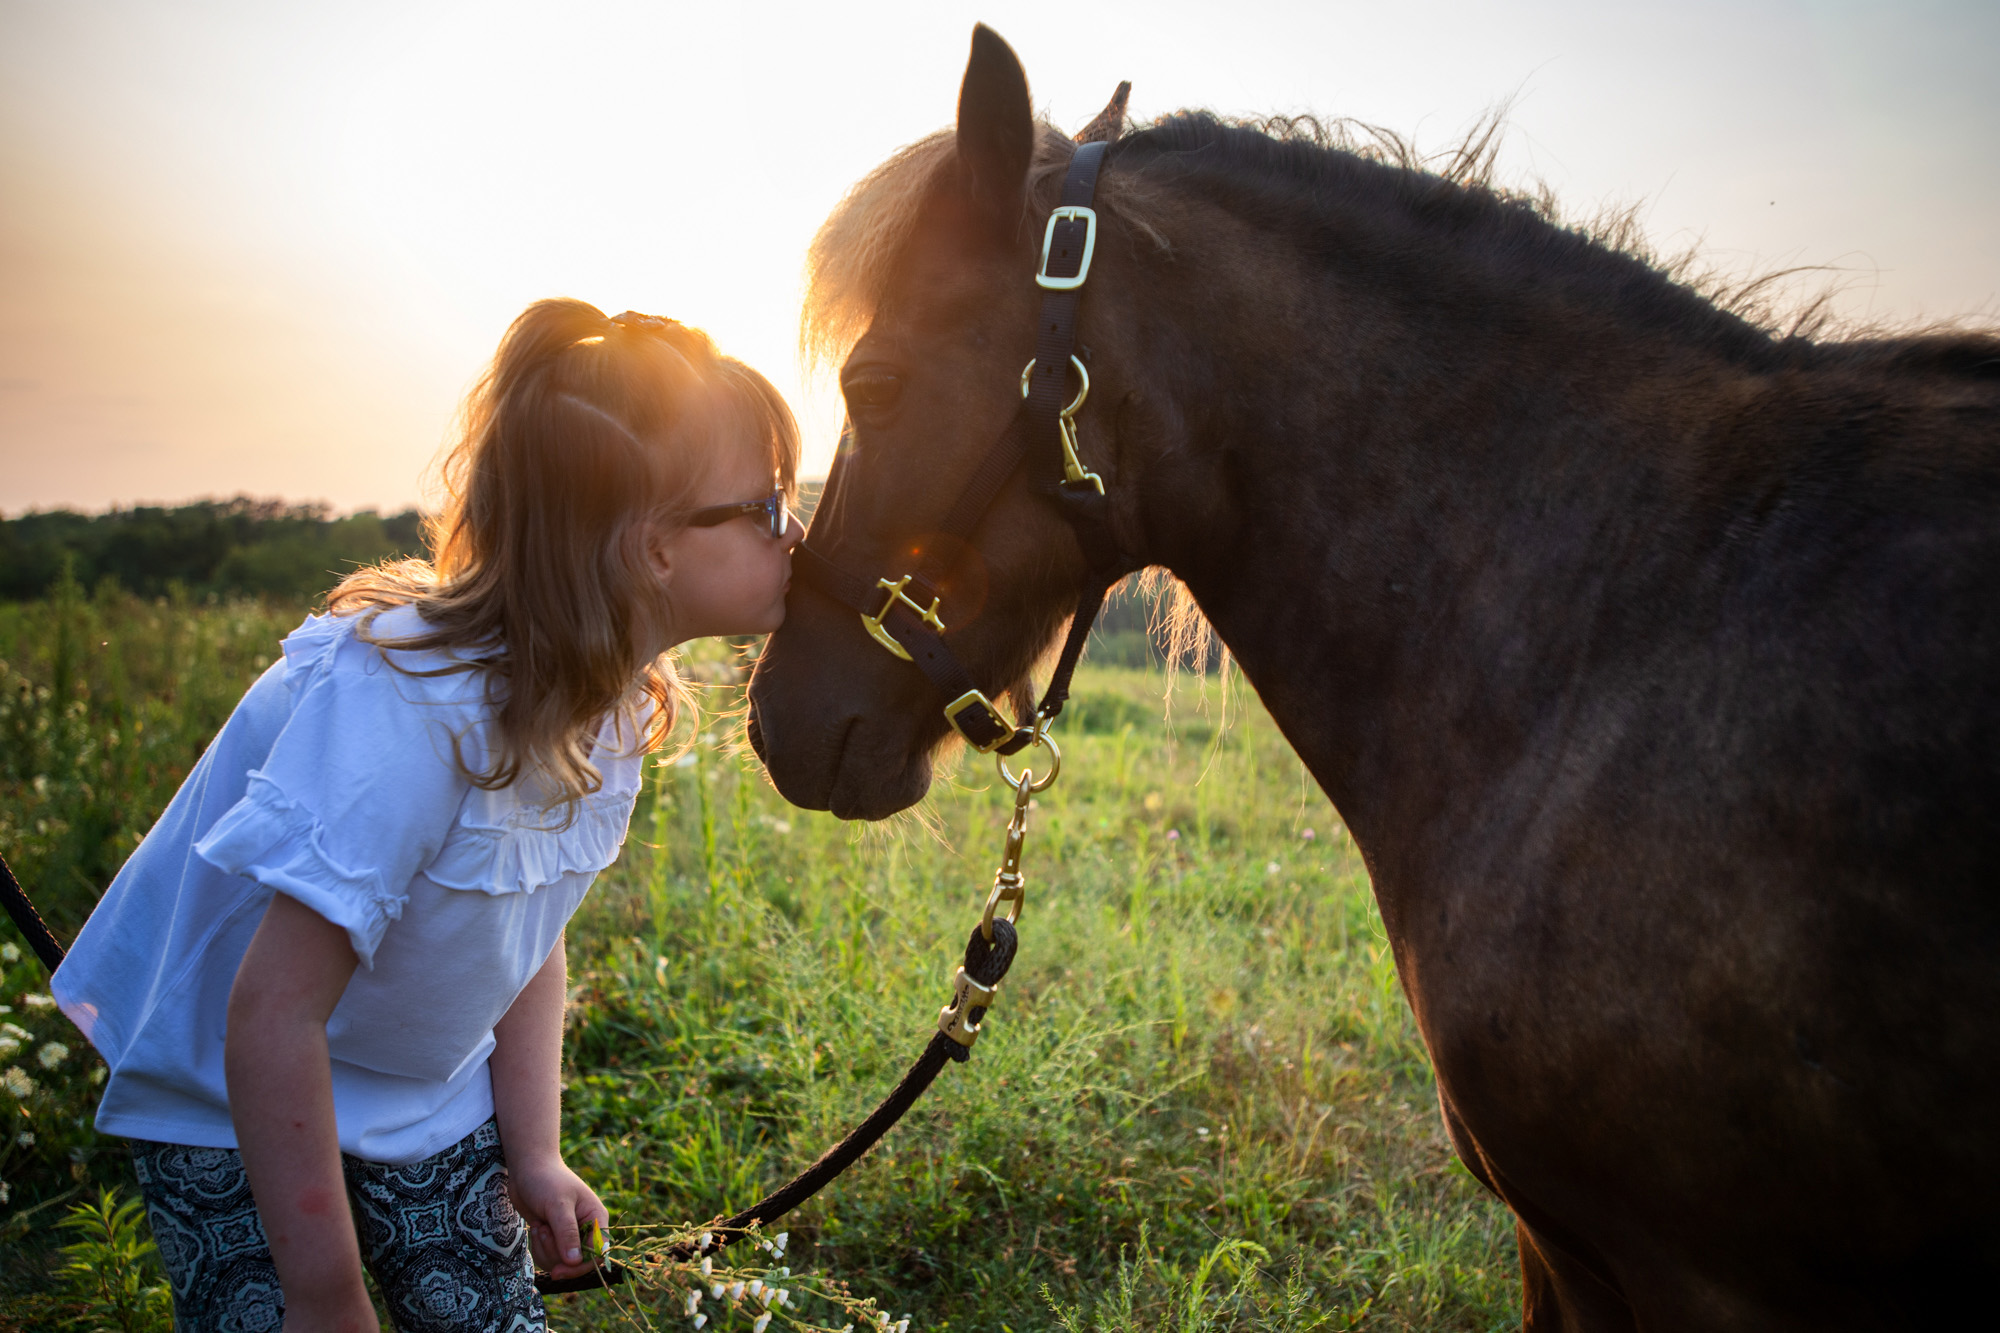 Nevaeh Brock with her horse